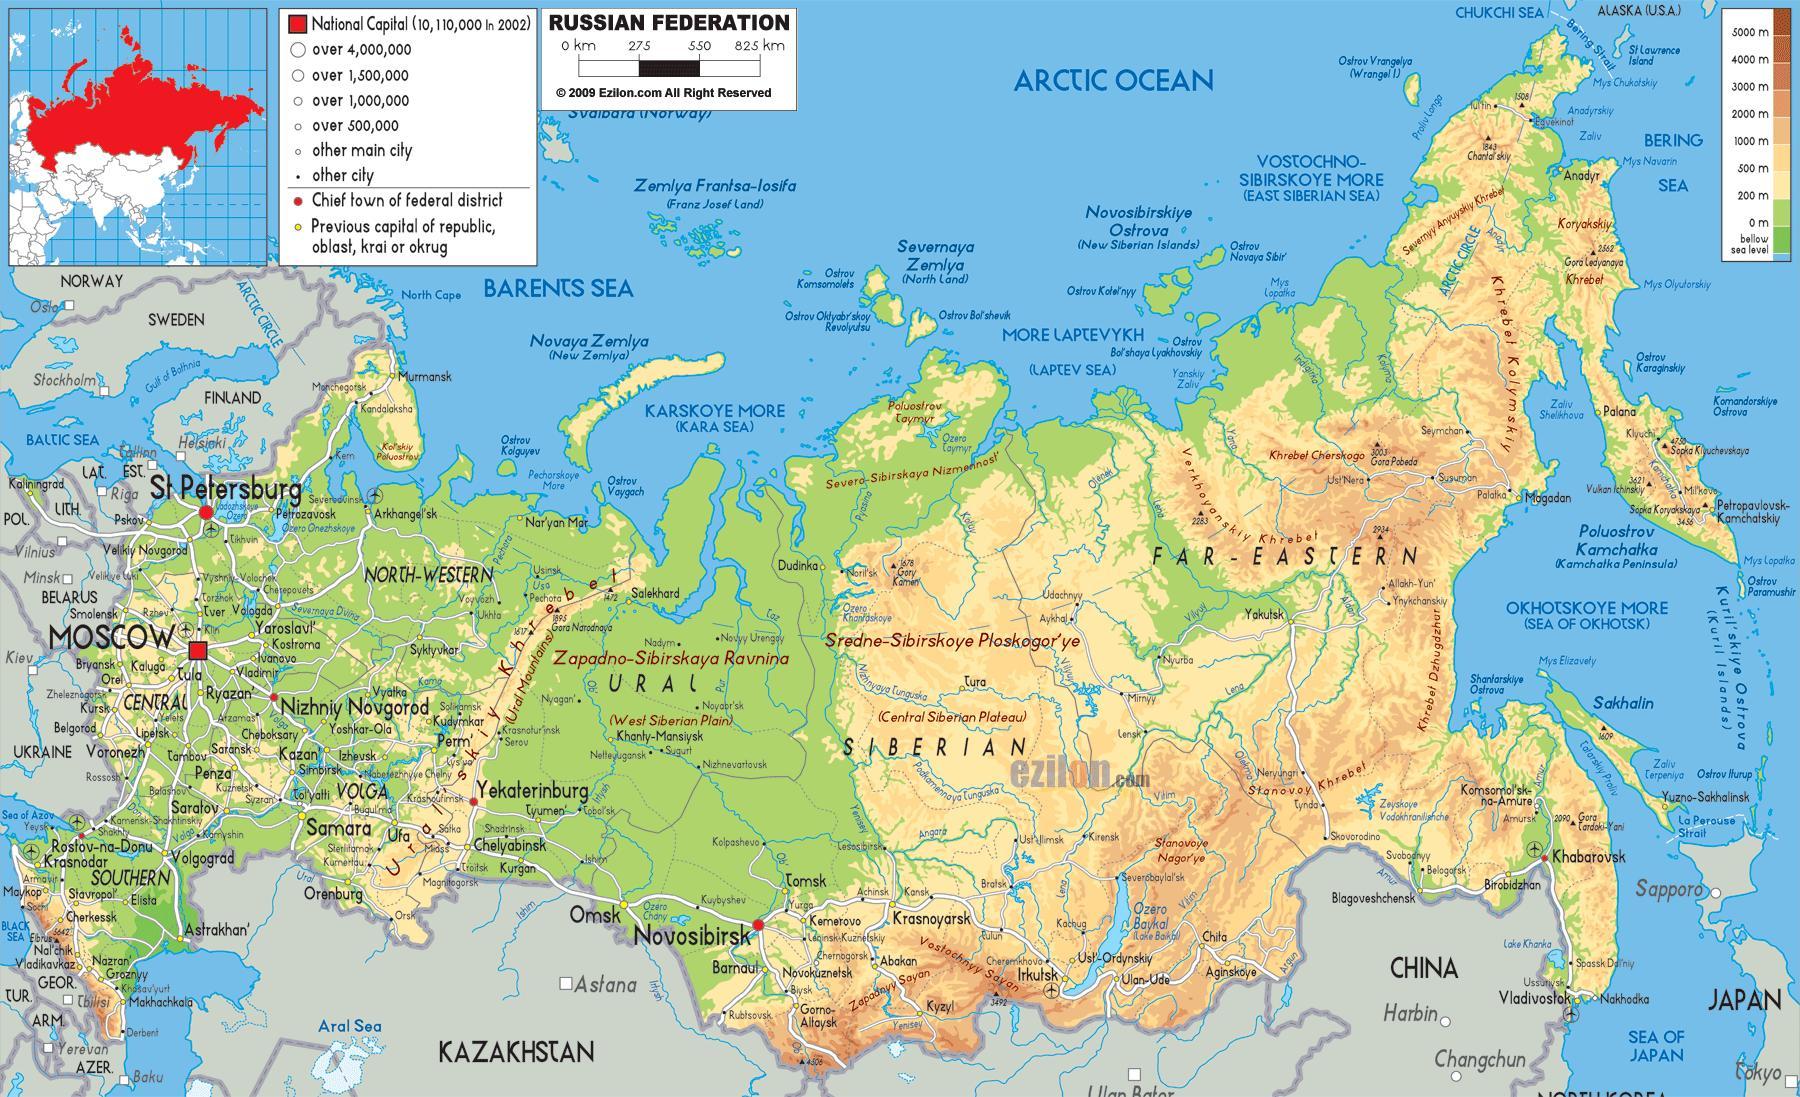 Rusland Museer Kort Kort Over Rusland Museer Ostlige Europa